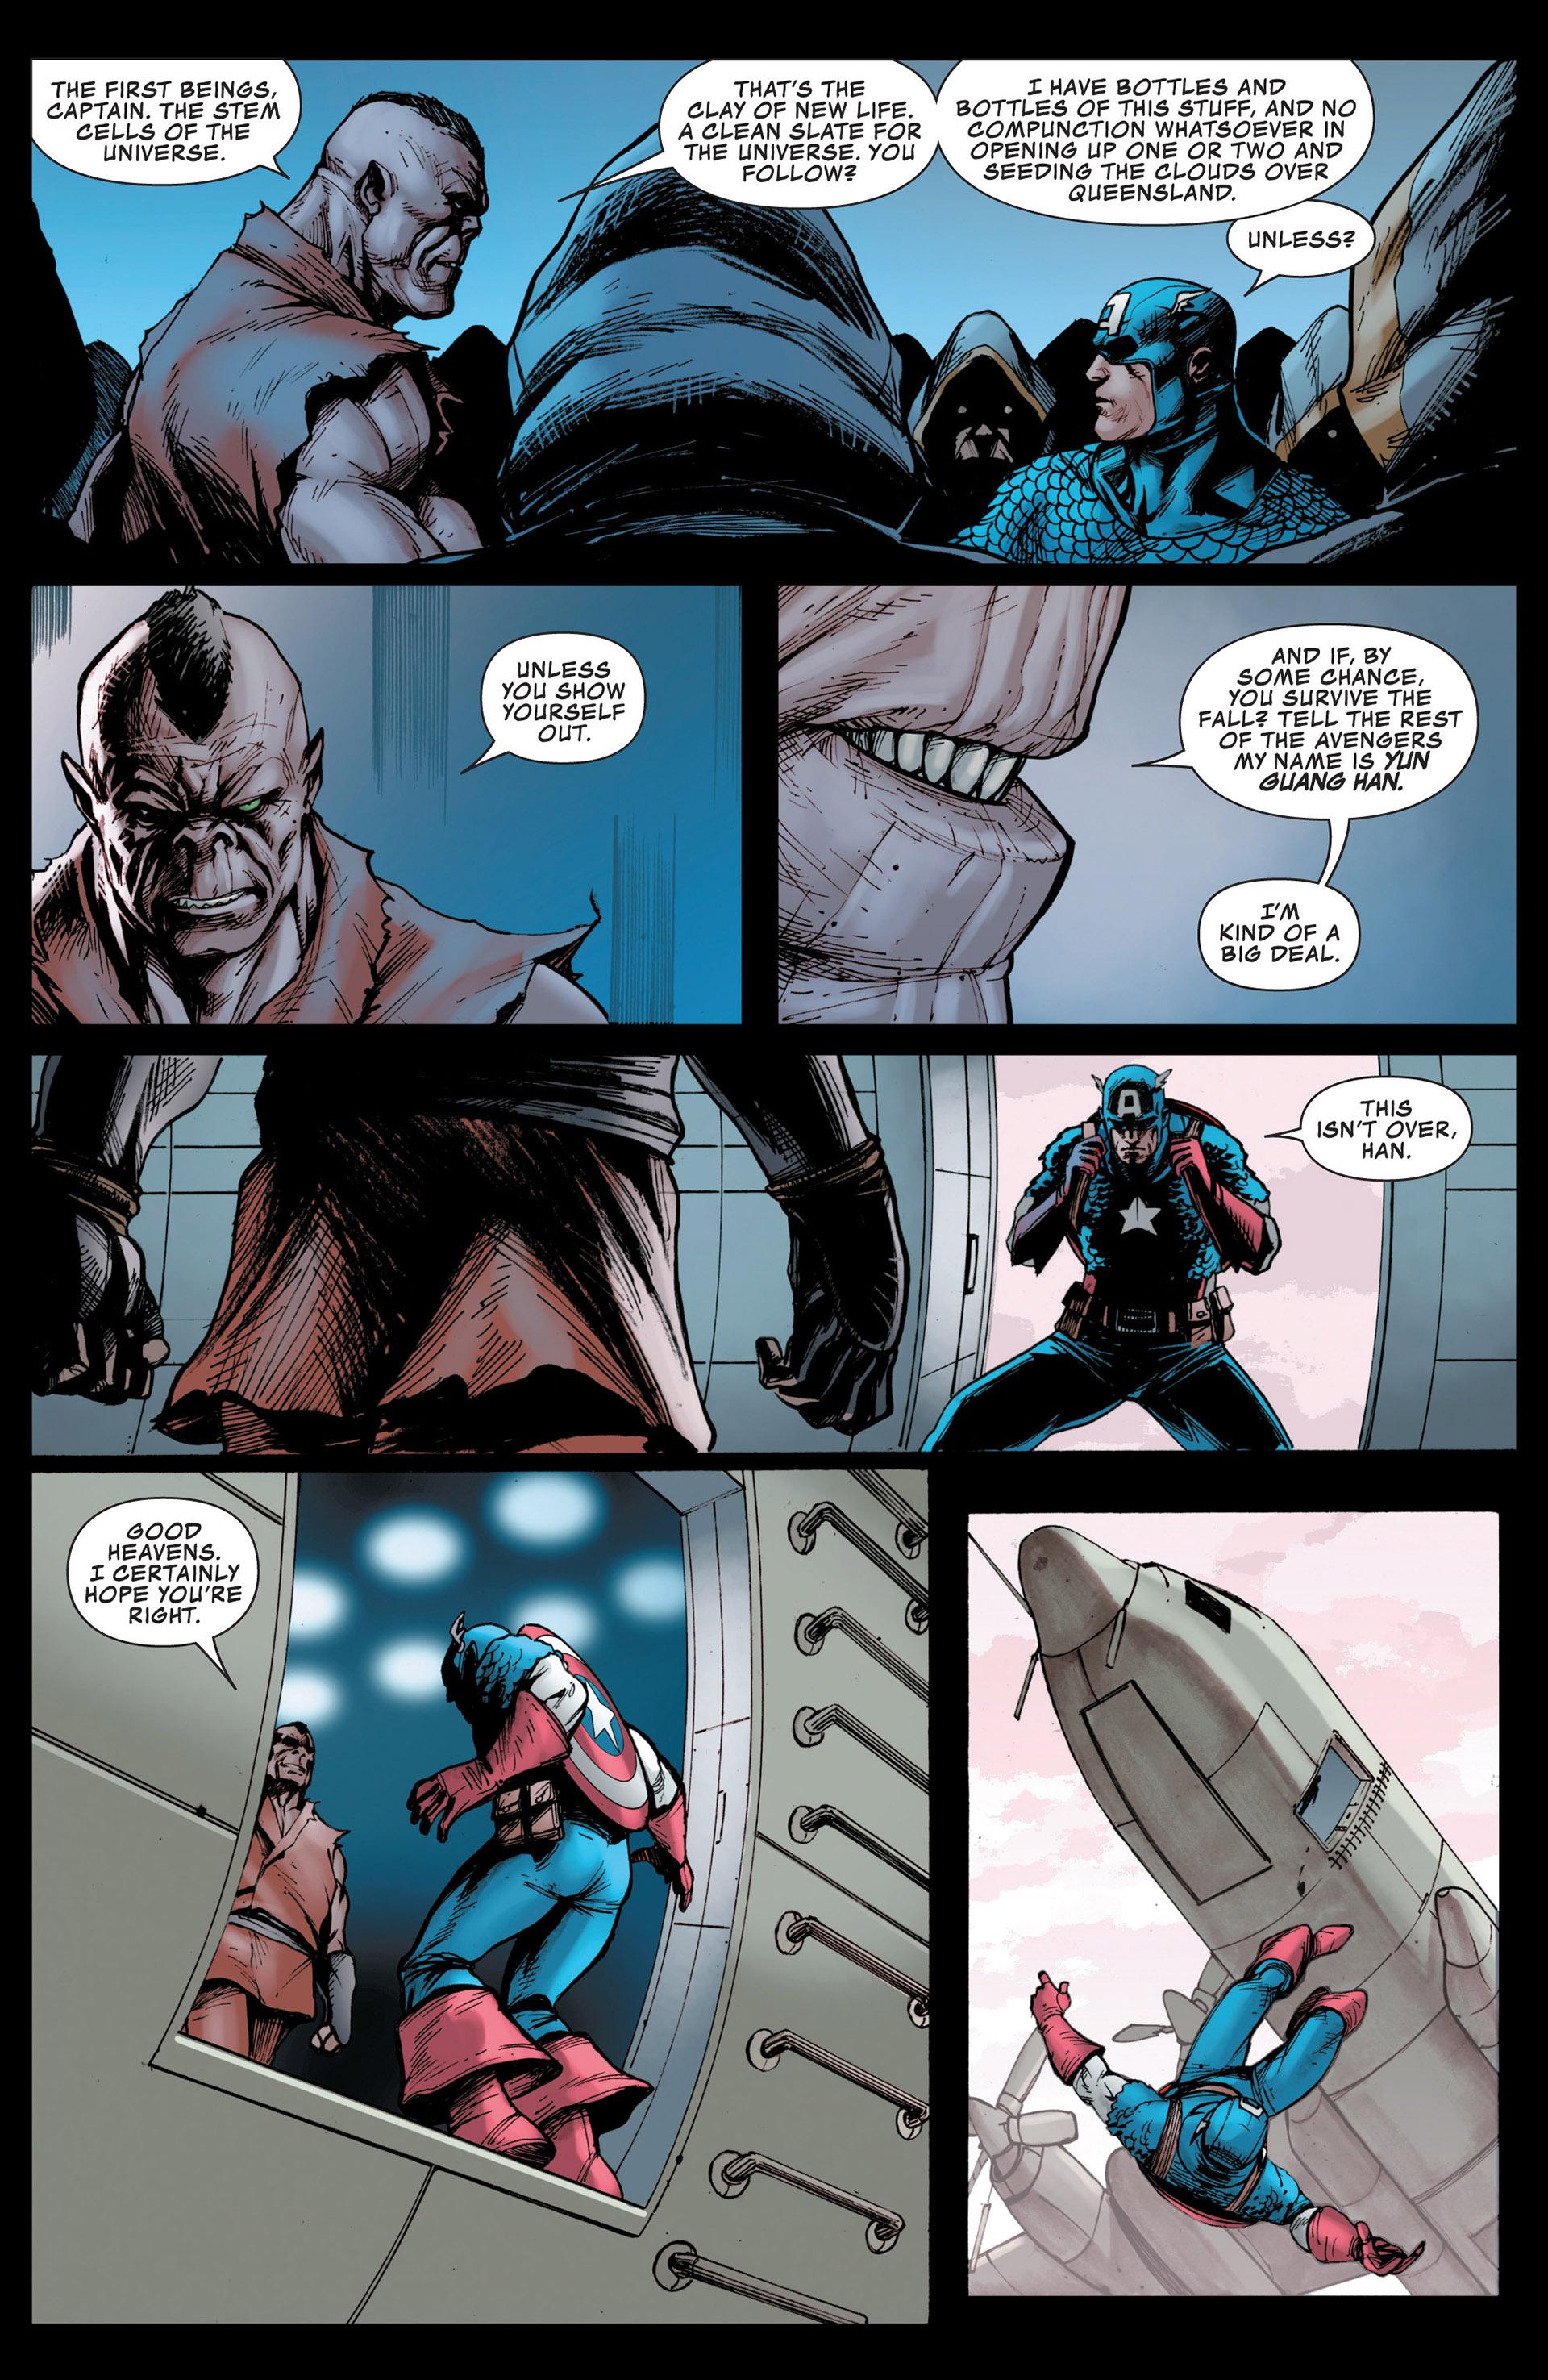 Avengers Assemble (2012) 10 Page 17